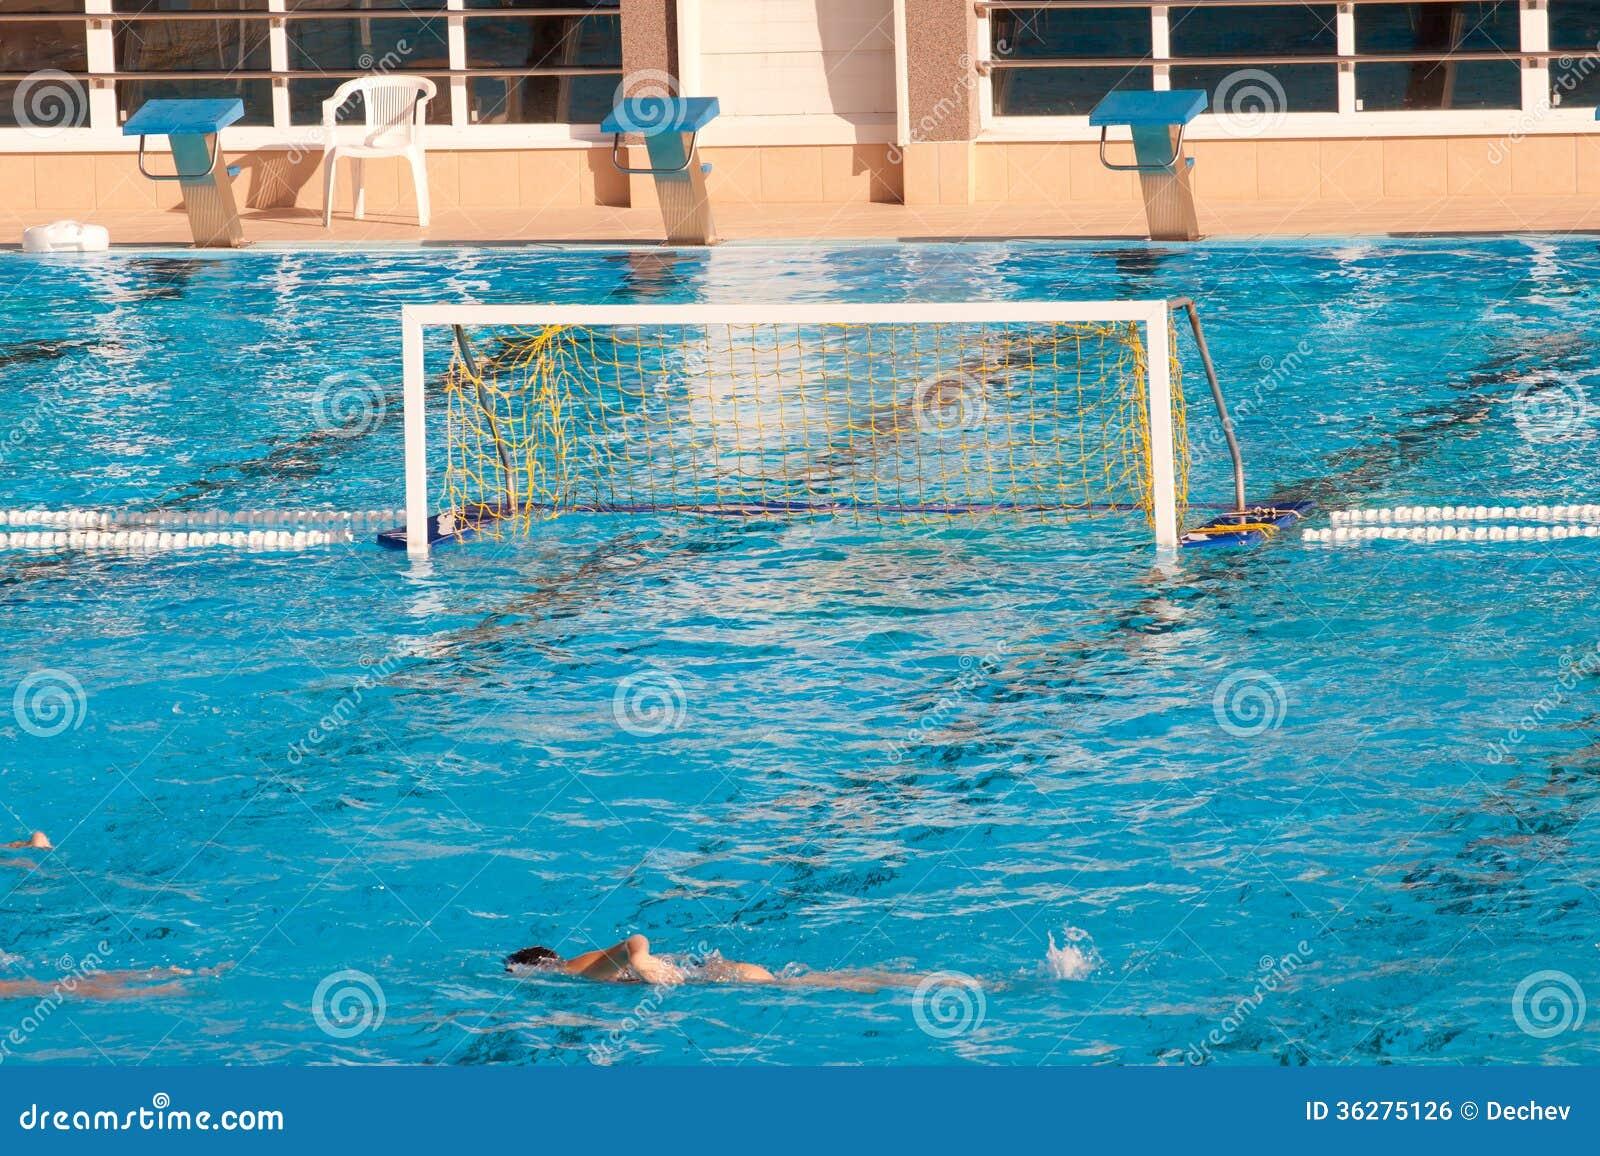 Water Polo Goal Stock Photo Image Of Empty Blue Aquatic